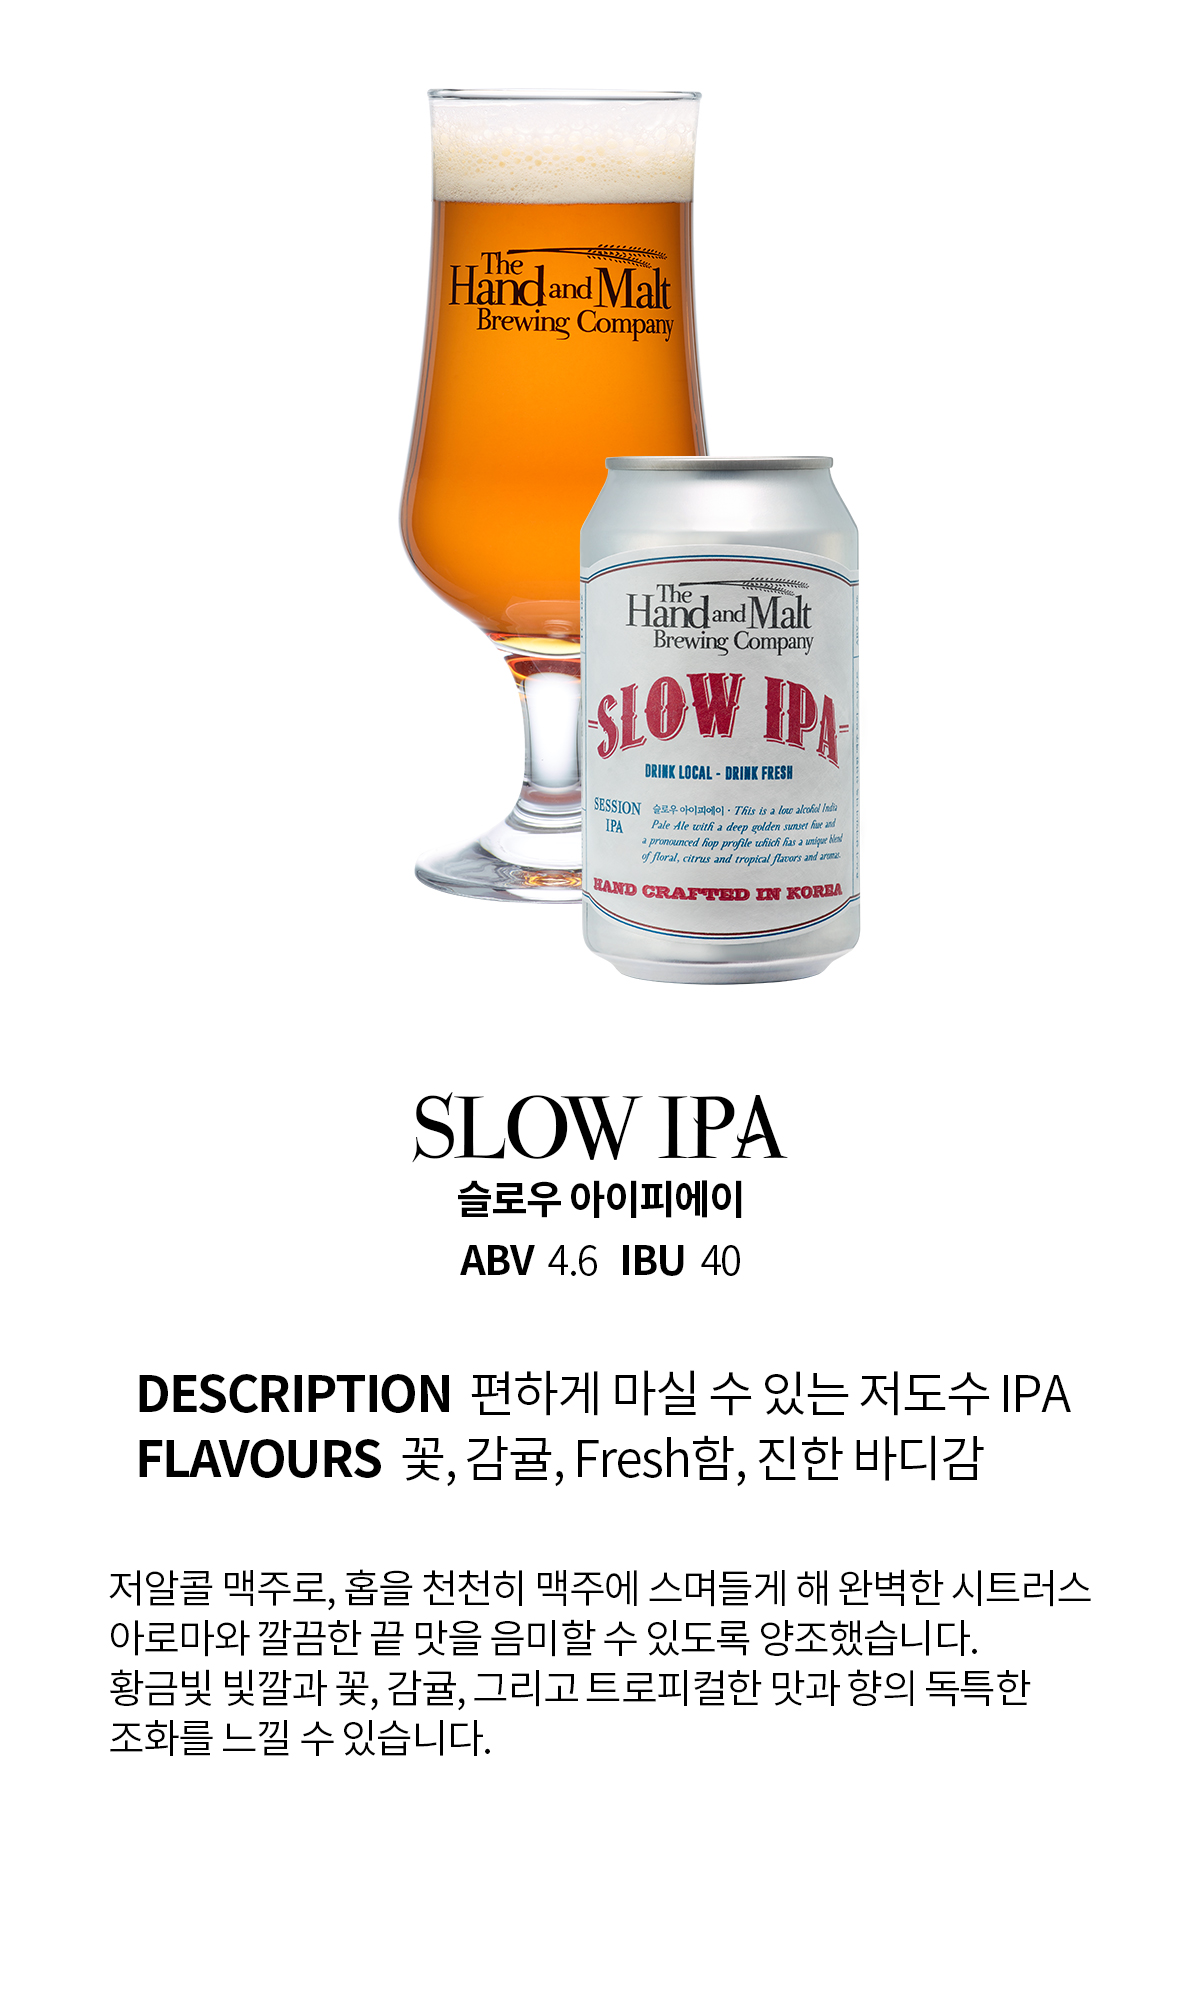 01_slow-ipa.jpg